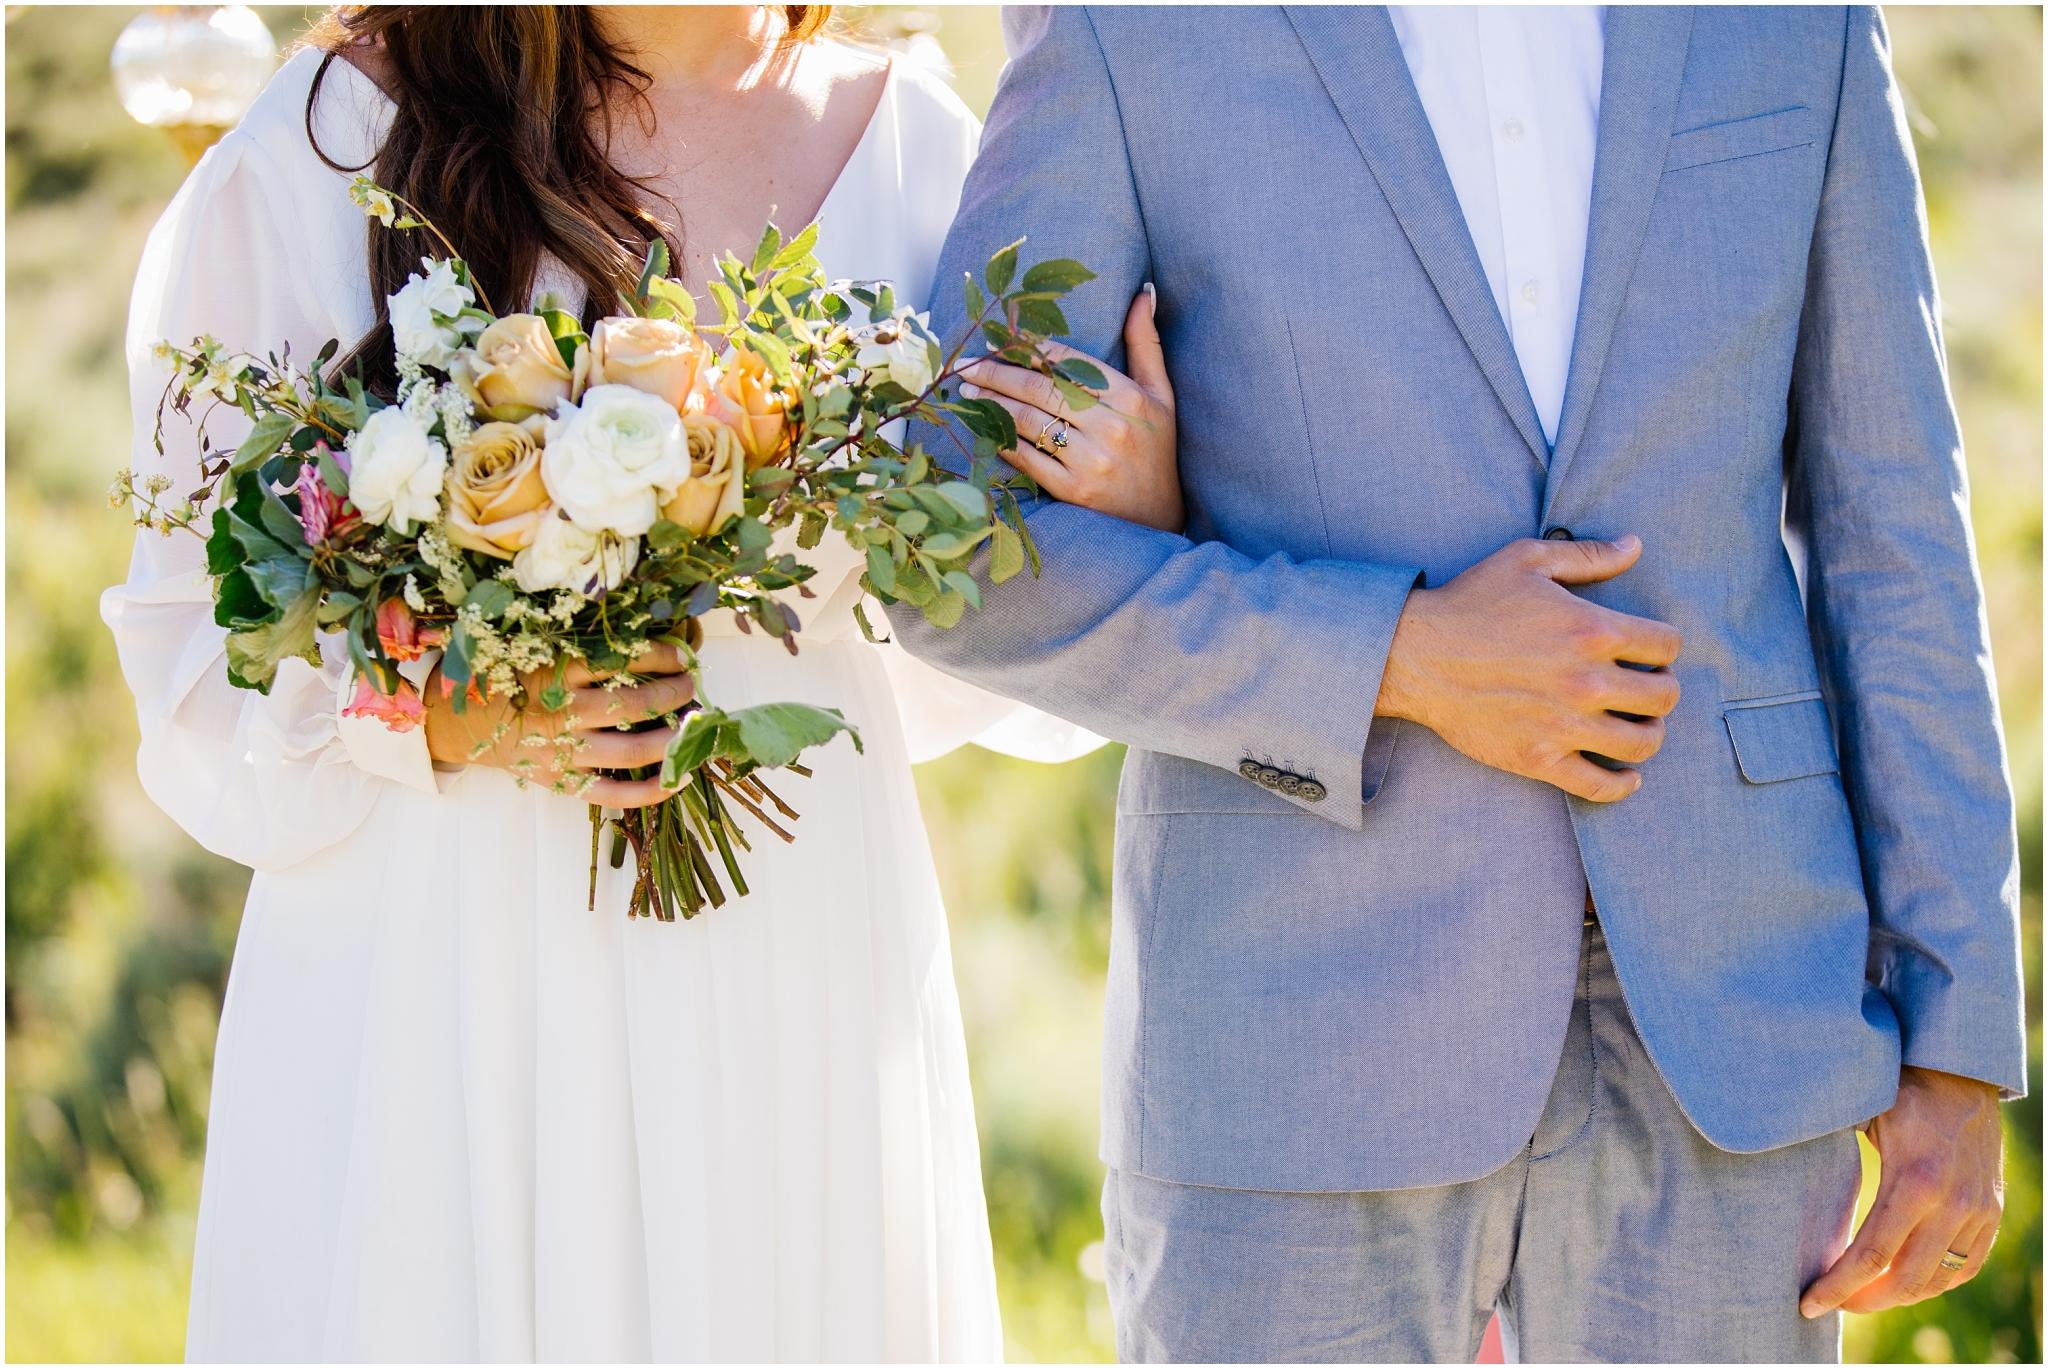 MountainShoot-25_Lizzie-B-Imagery-Utah-Wedding-Photographer-Salt-Lake-City-Park-City-Utah-County.jpg